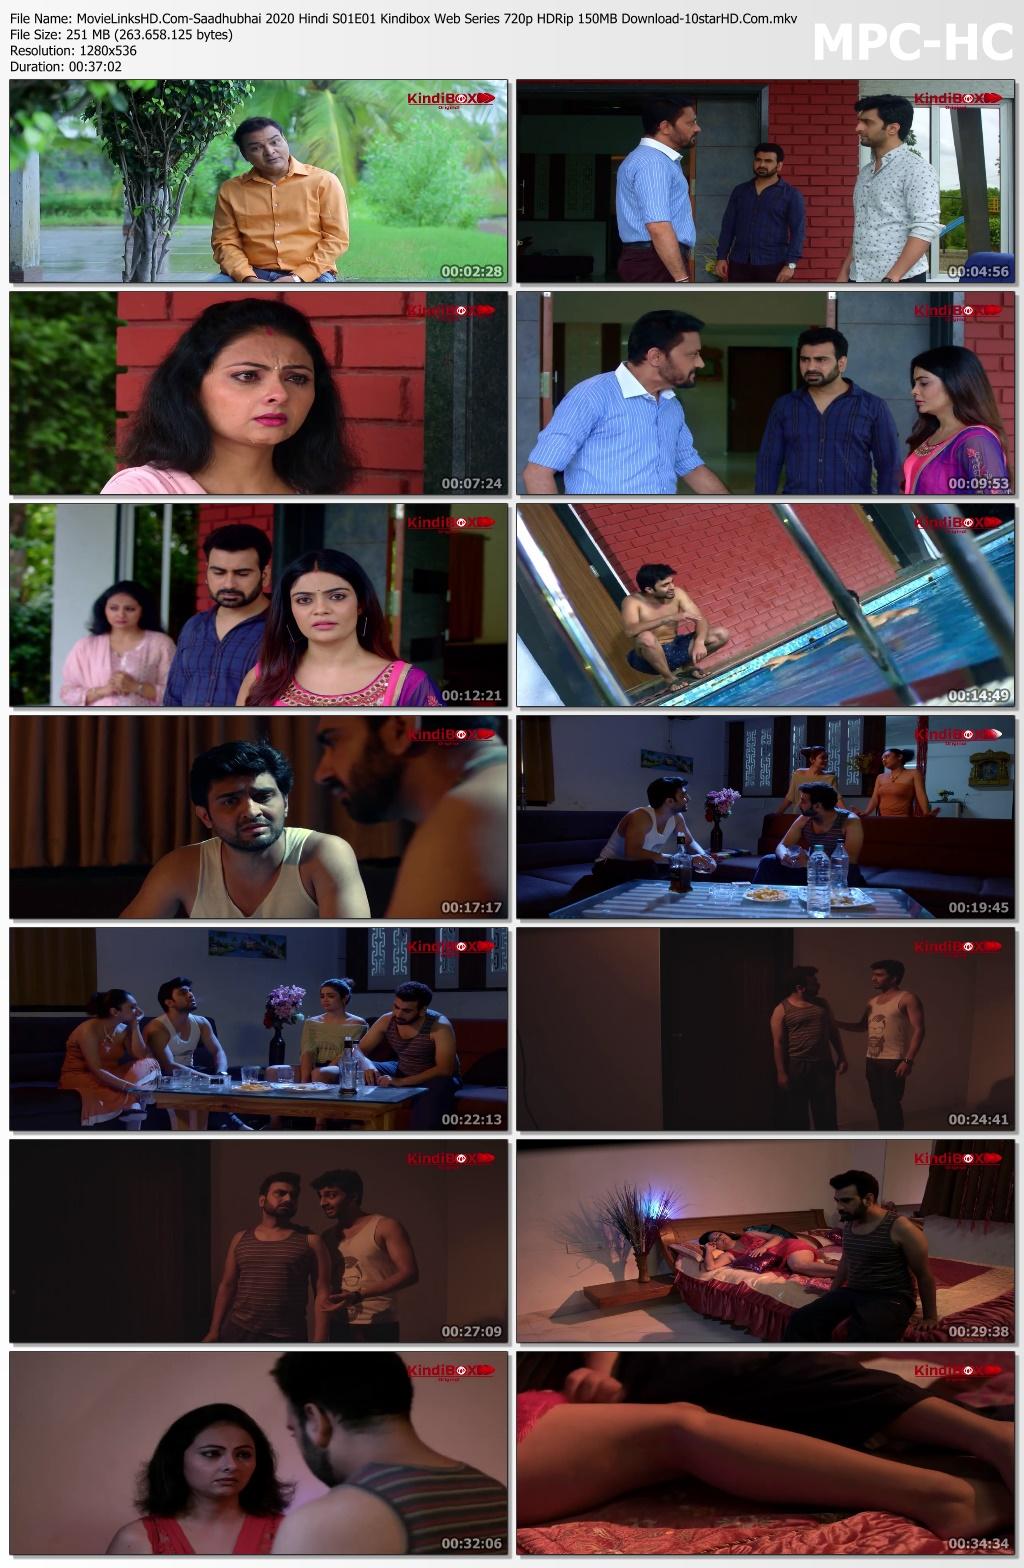 Movie-Links-HD-Com-Saadhubhai-2020-Hindi-S01-E01-Kindibox-Web-Series-720p-HDRip-150-MB-Download-10st